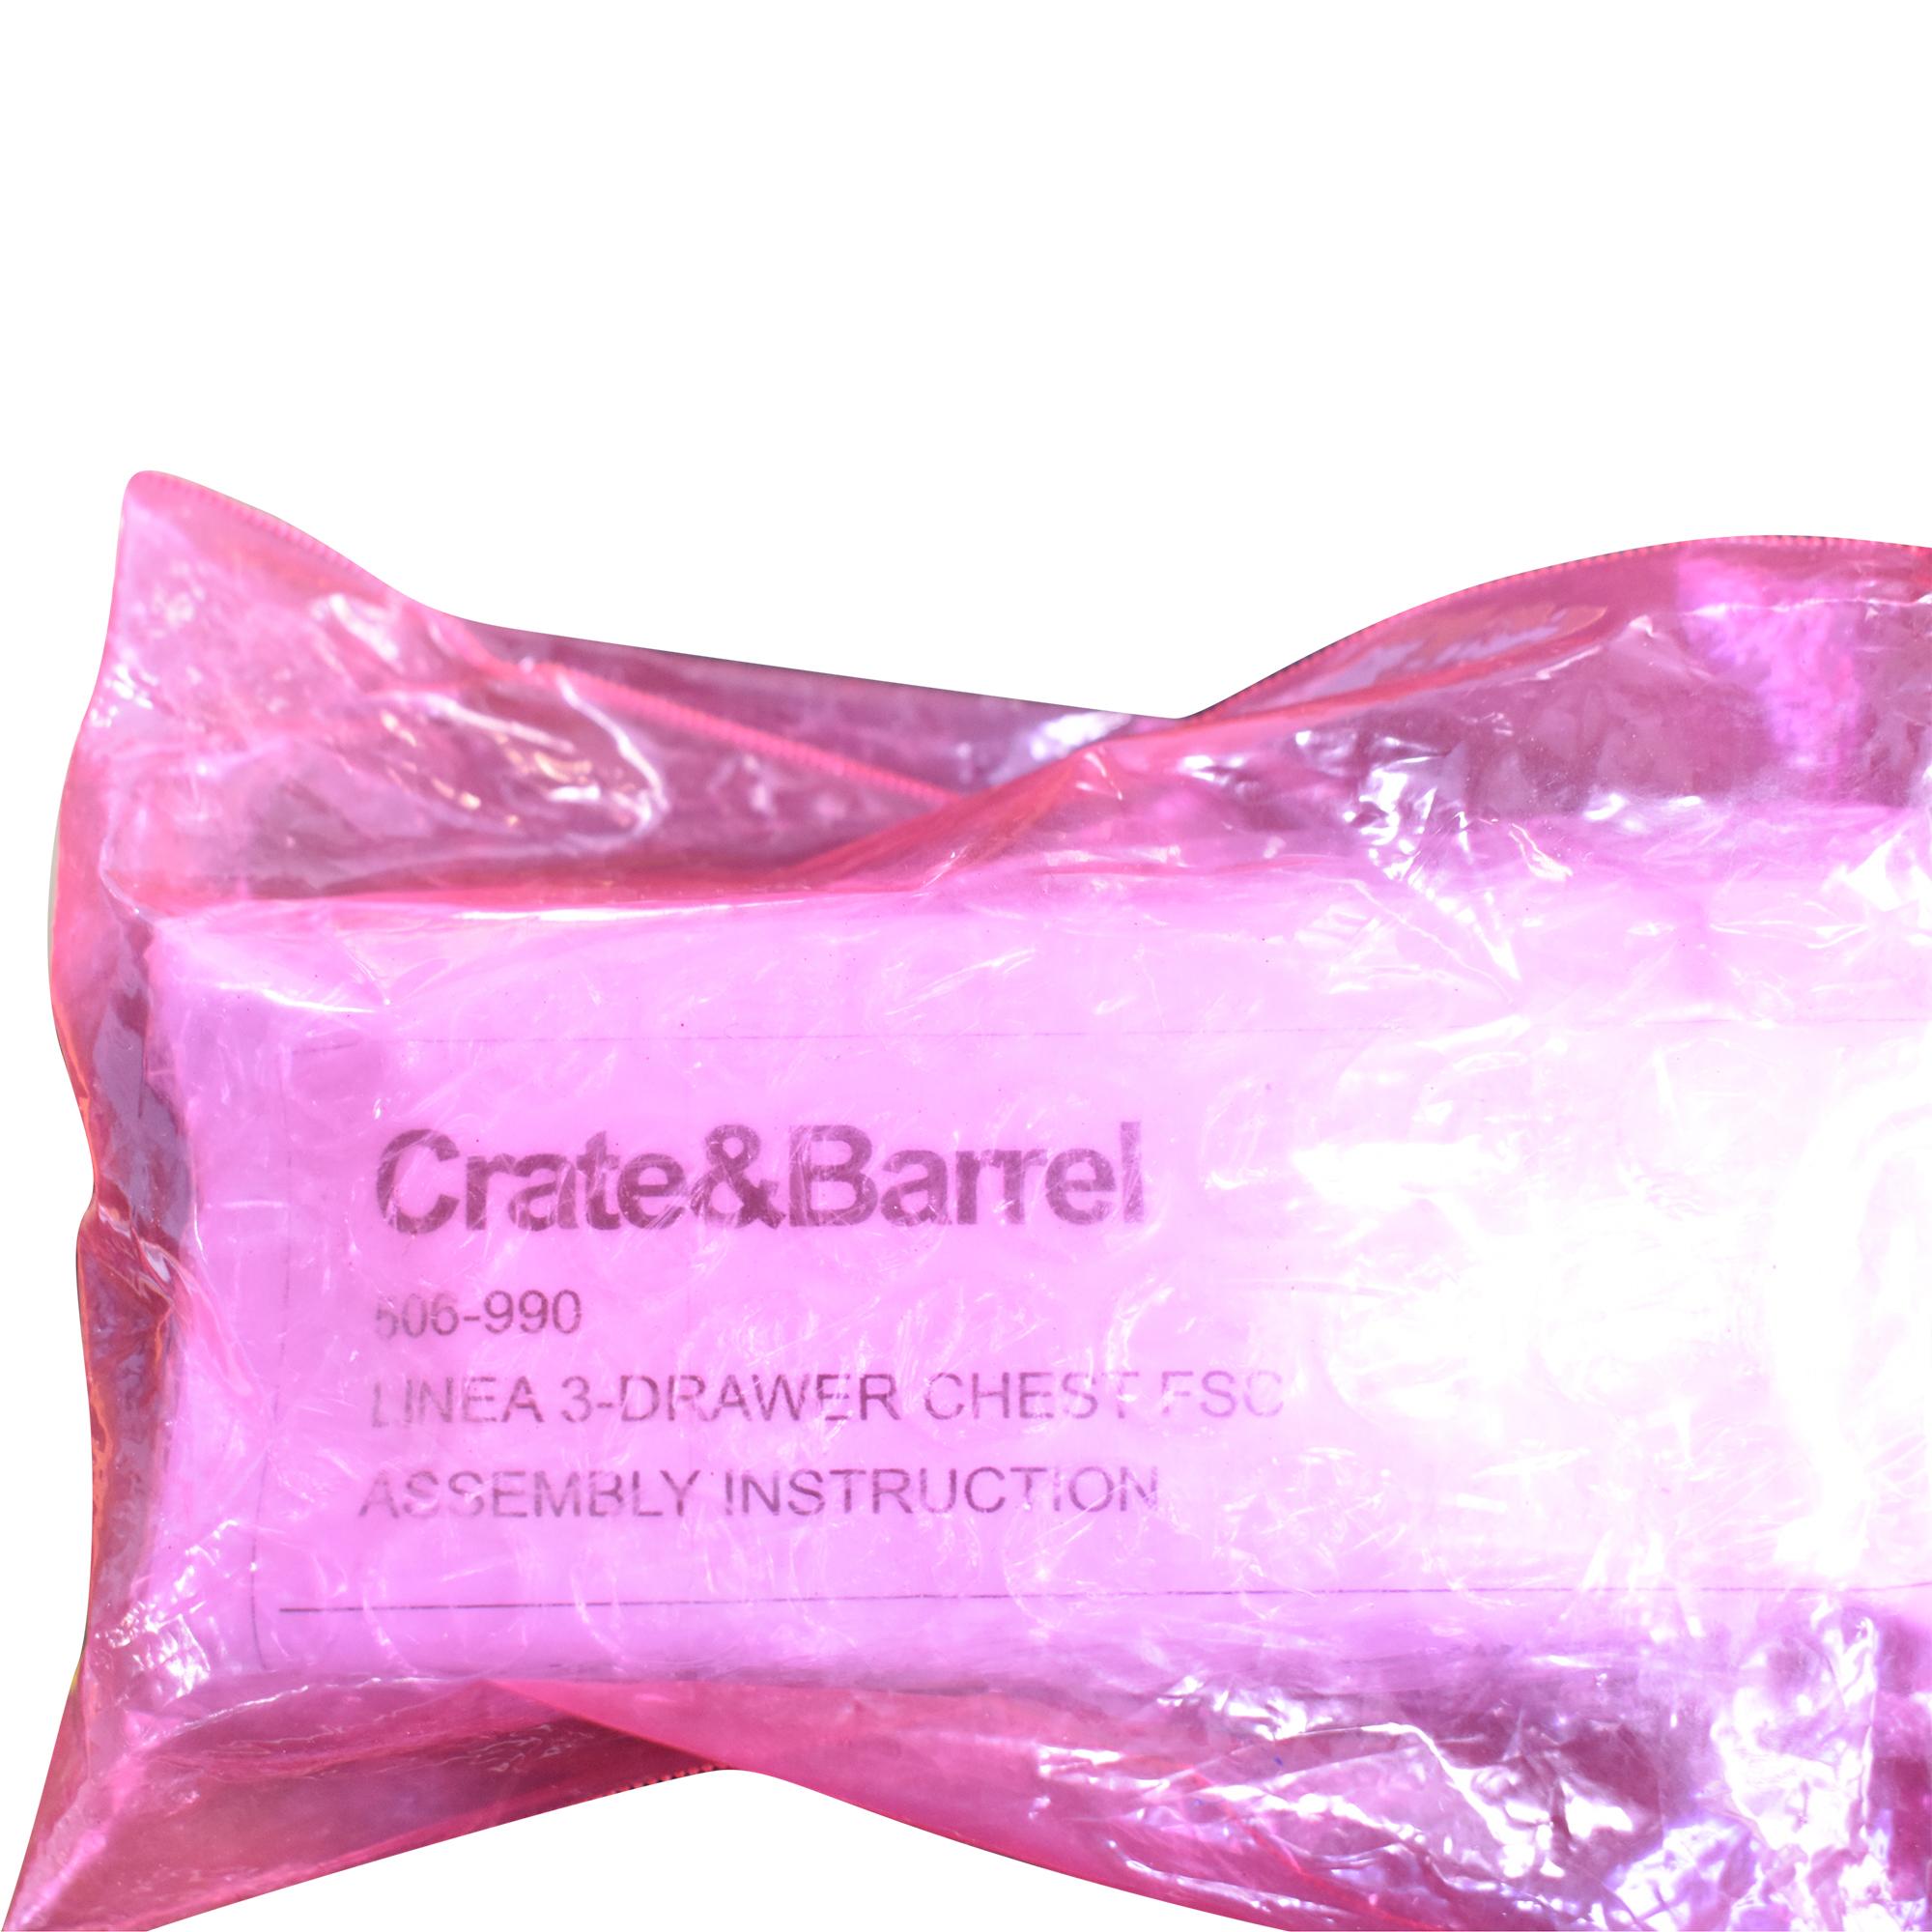 Crate & Barrel Crate & Barrel Linea II Three-Drawer Chest ma